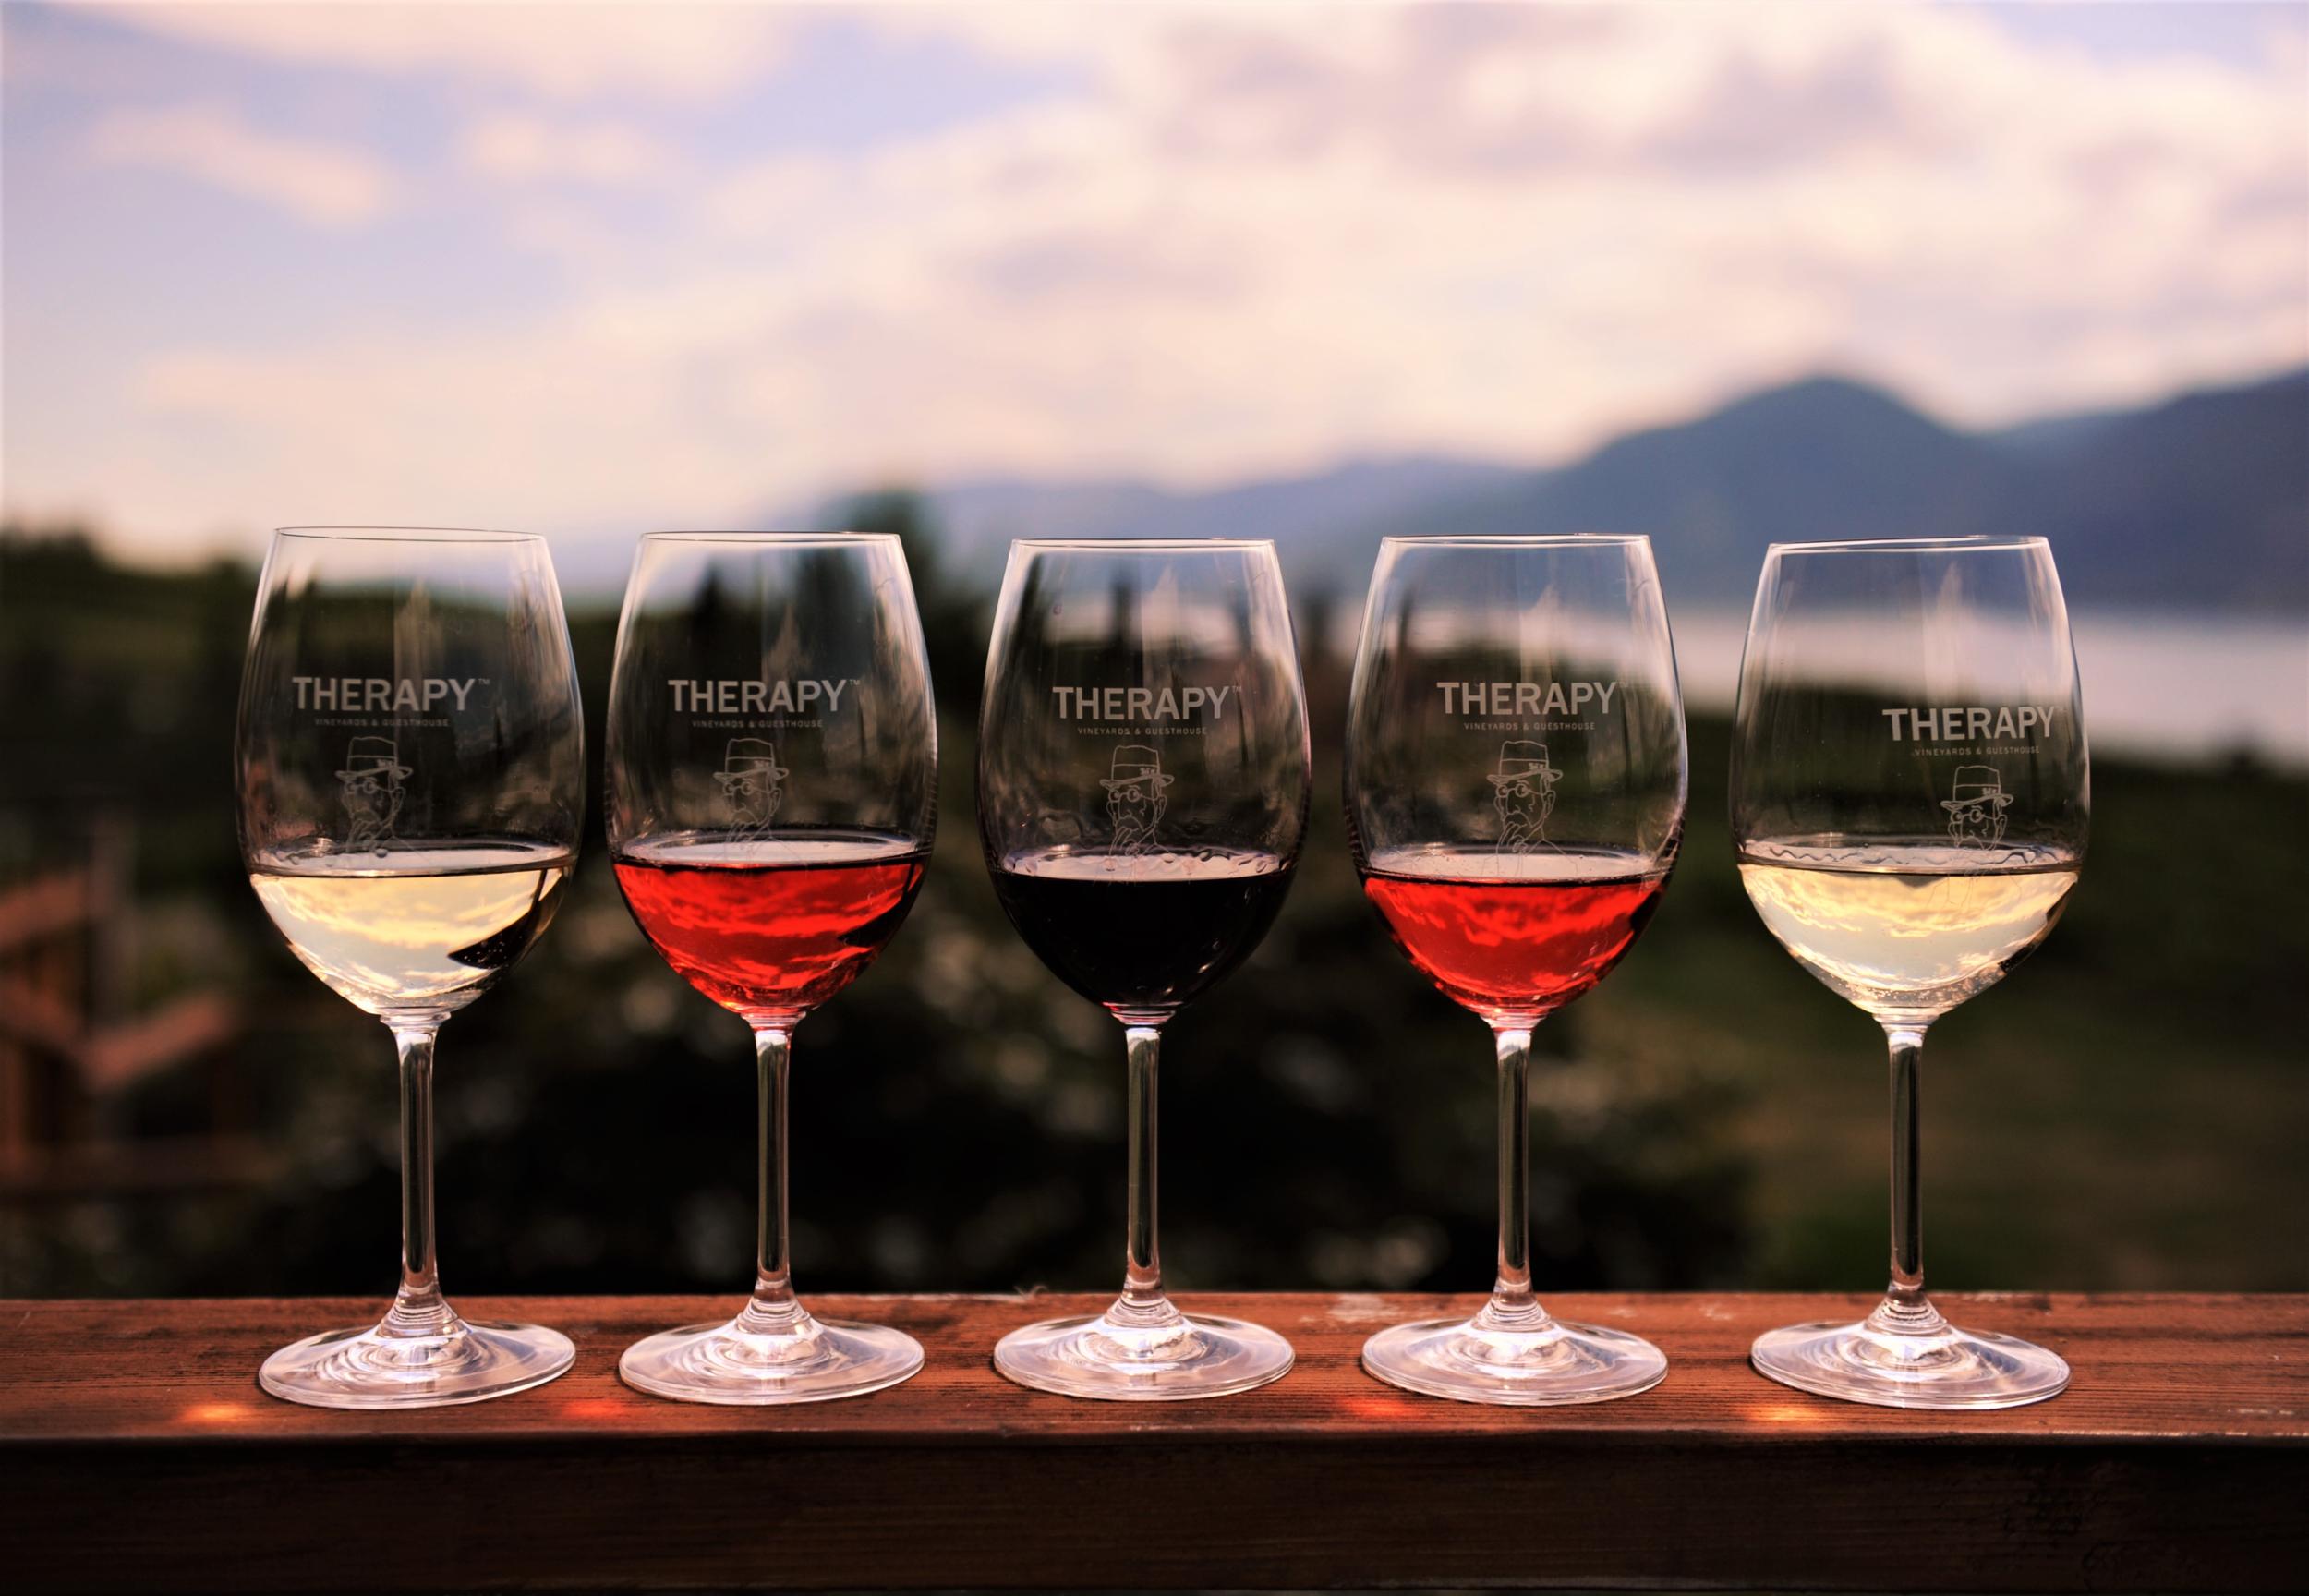 Therapy-Vineyards-Guesthouse-naramata-Okanagan-valley-vagabonds